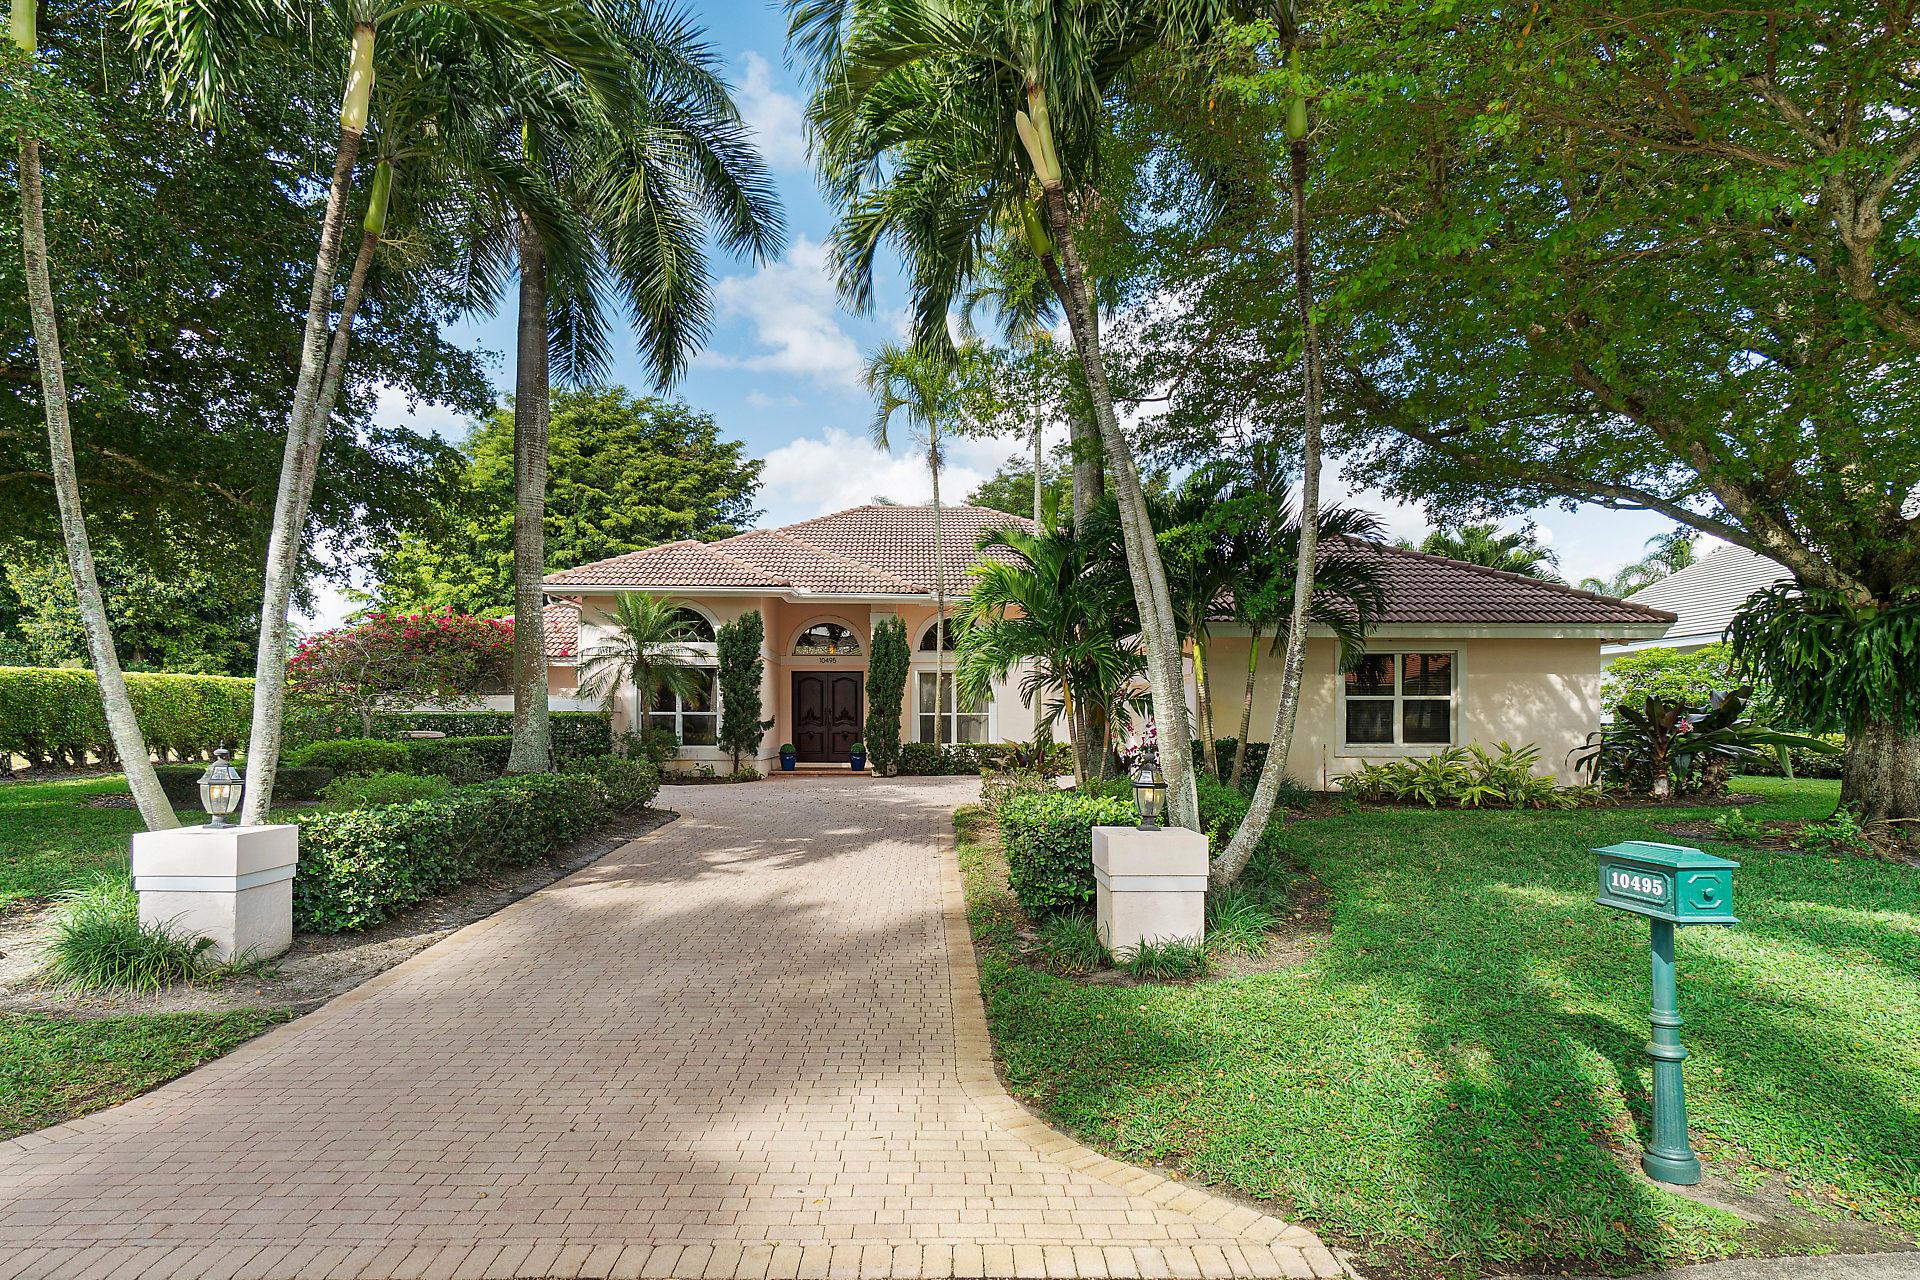 Home for sale in Pine Tree Golf Club Boynton Beach Florida